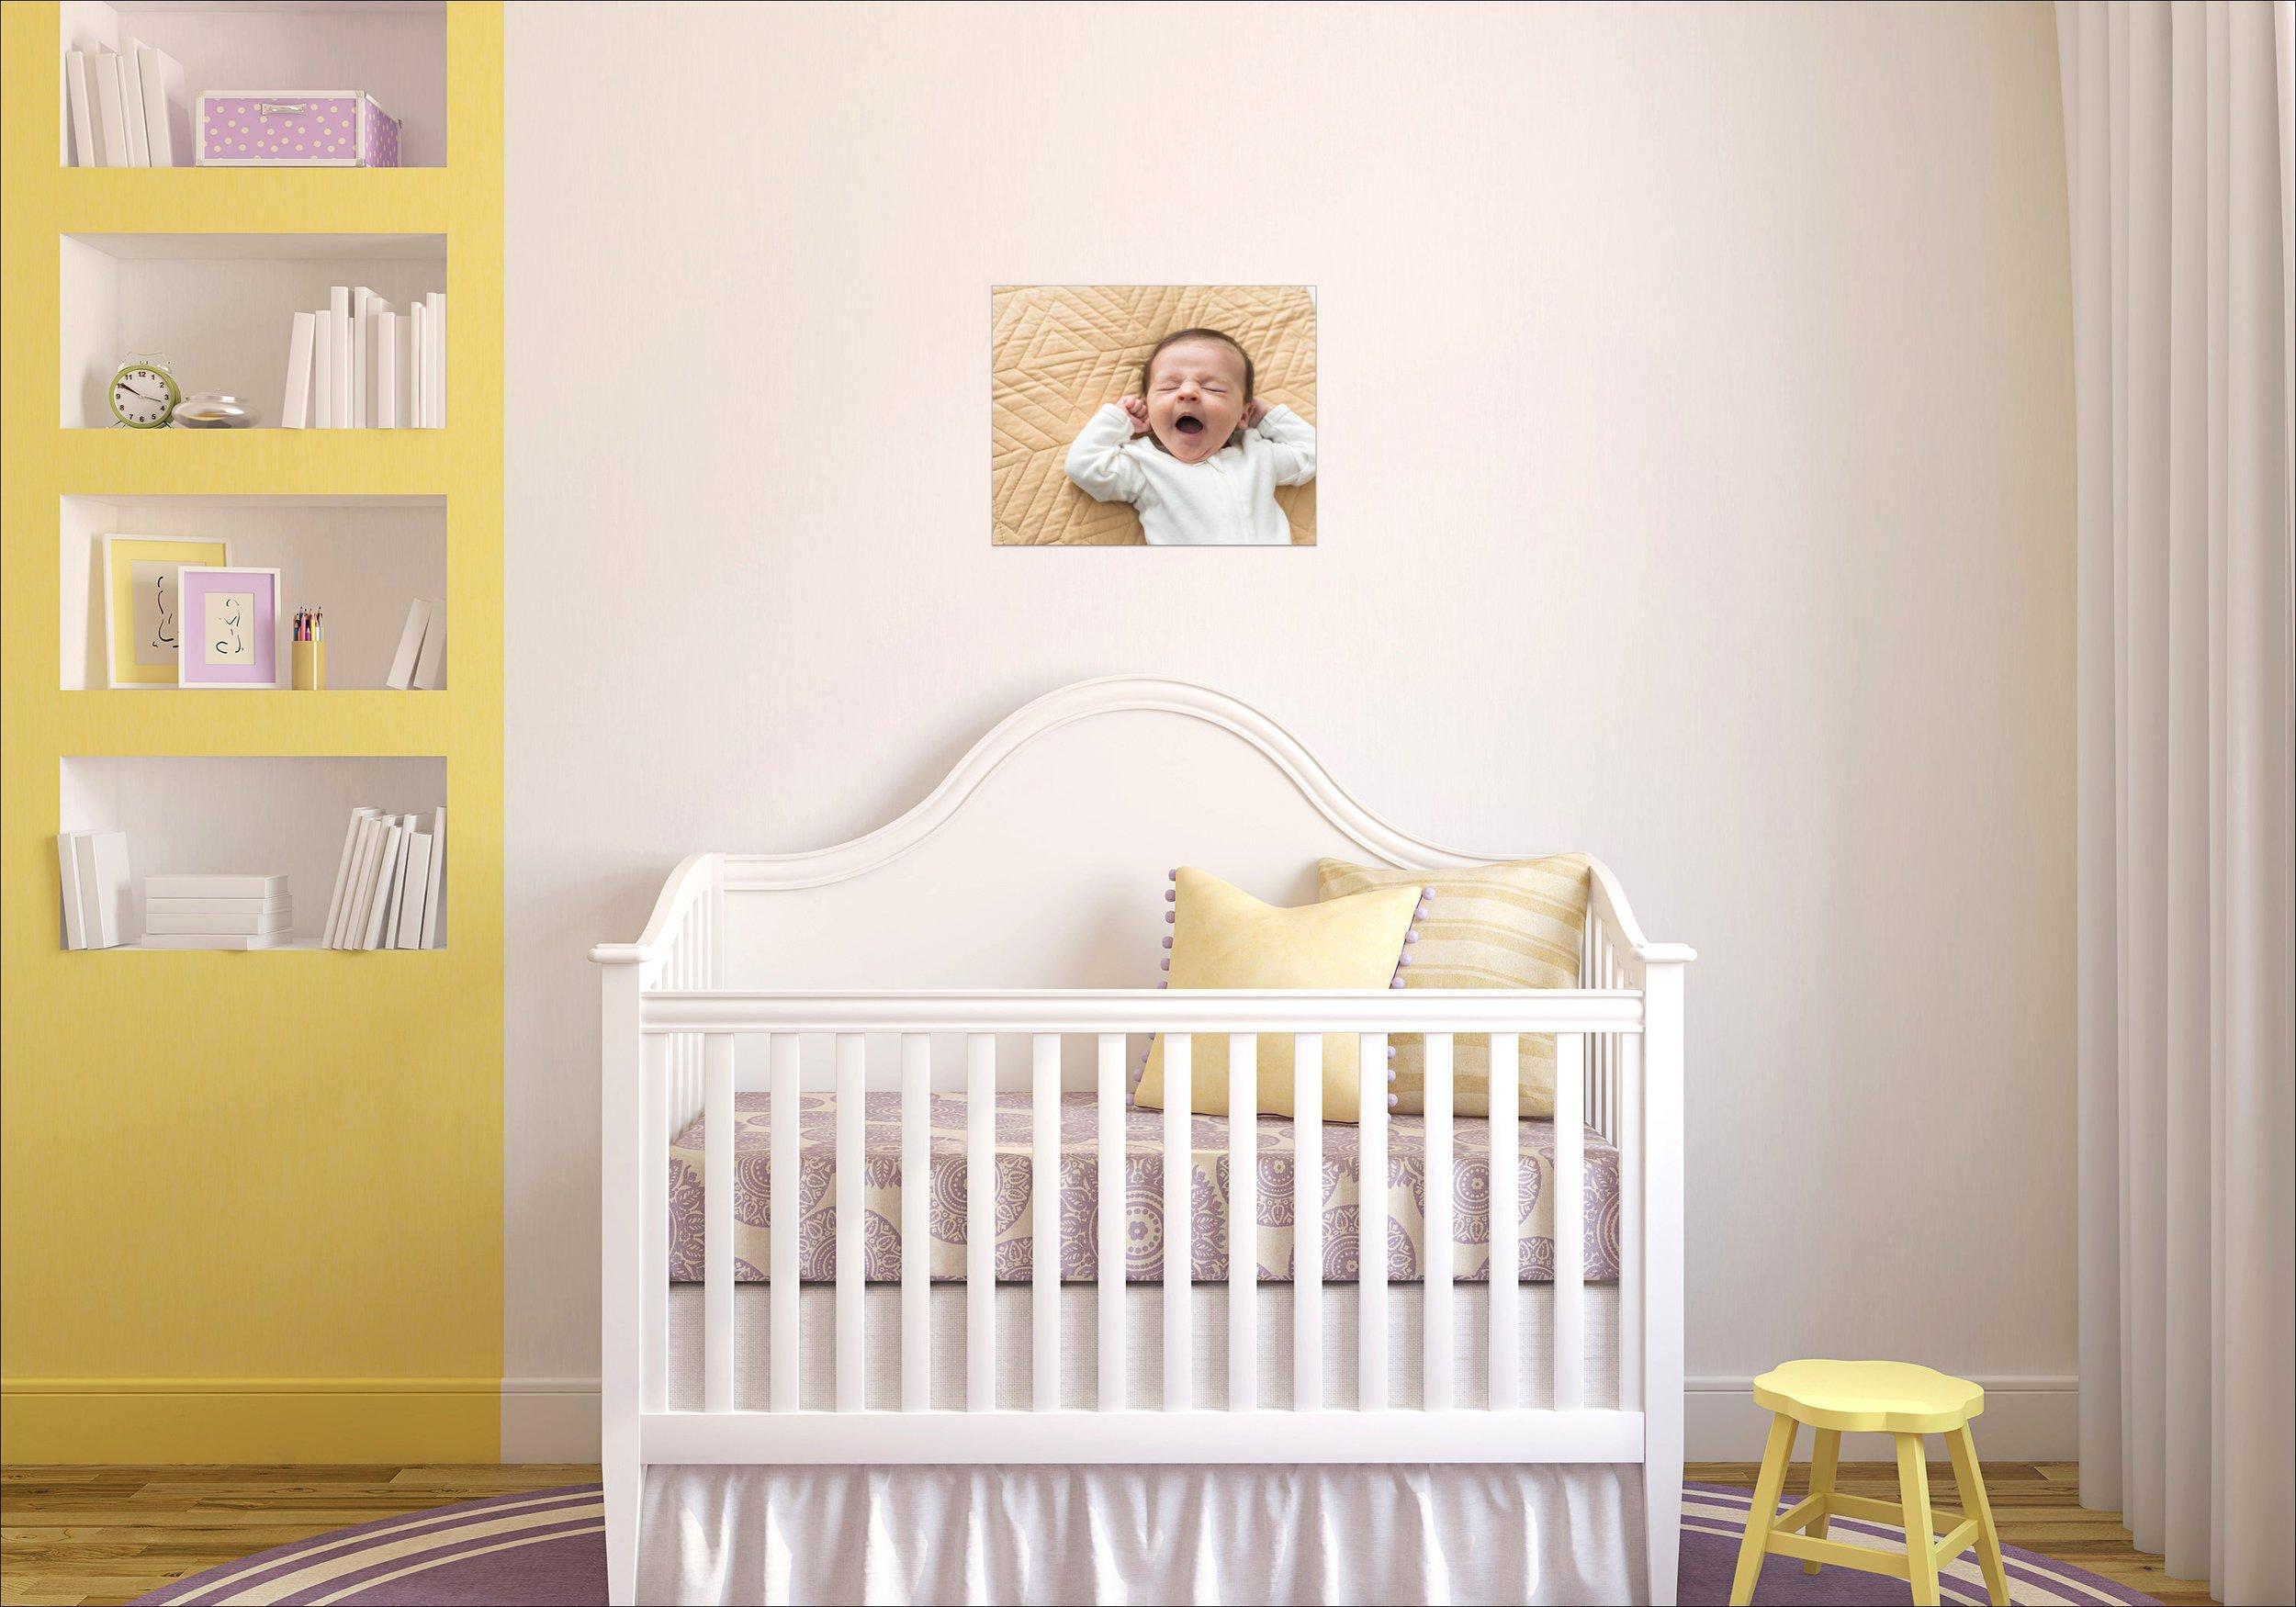 newborn wall display | Montgomery County pa photographer